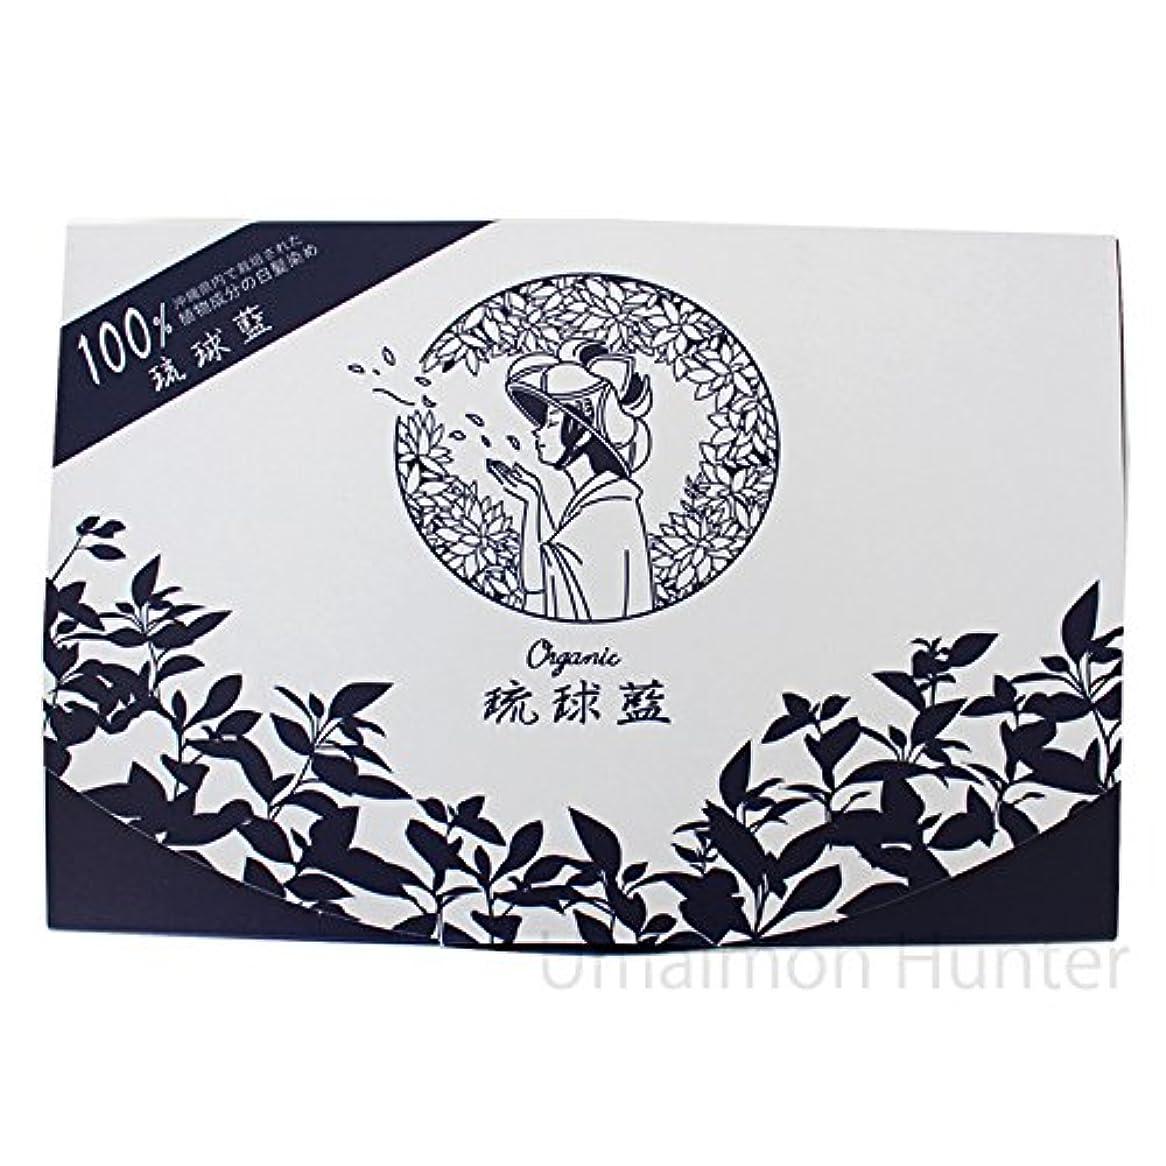 実際に差別再生琉球藍 100g 箱入り×1箱 箱無×2P 特許取得済 琉球藍を天然染毛剤に